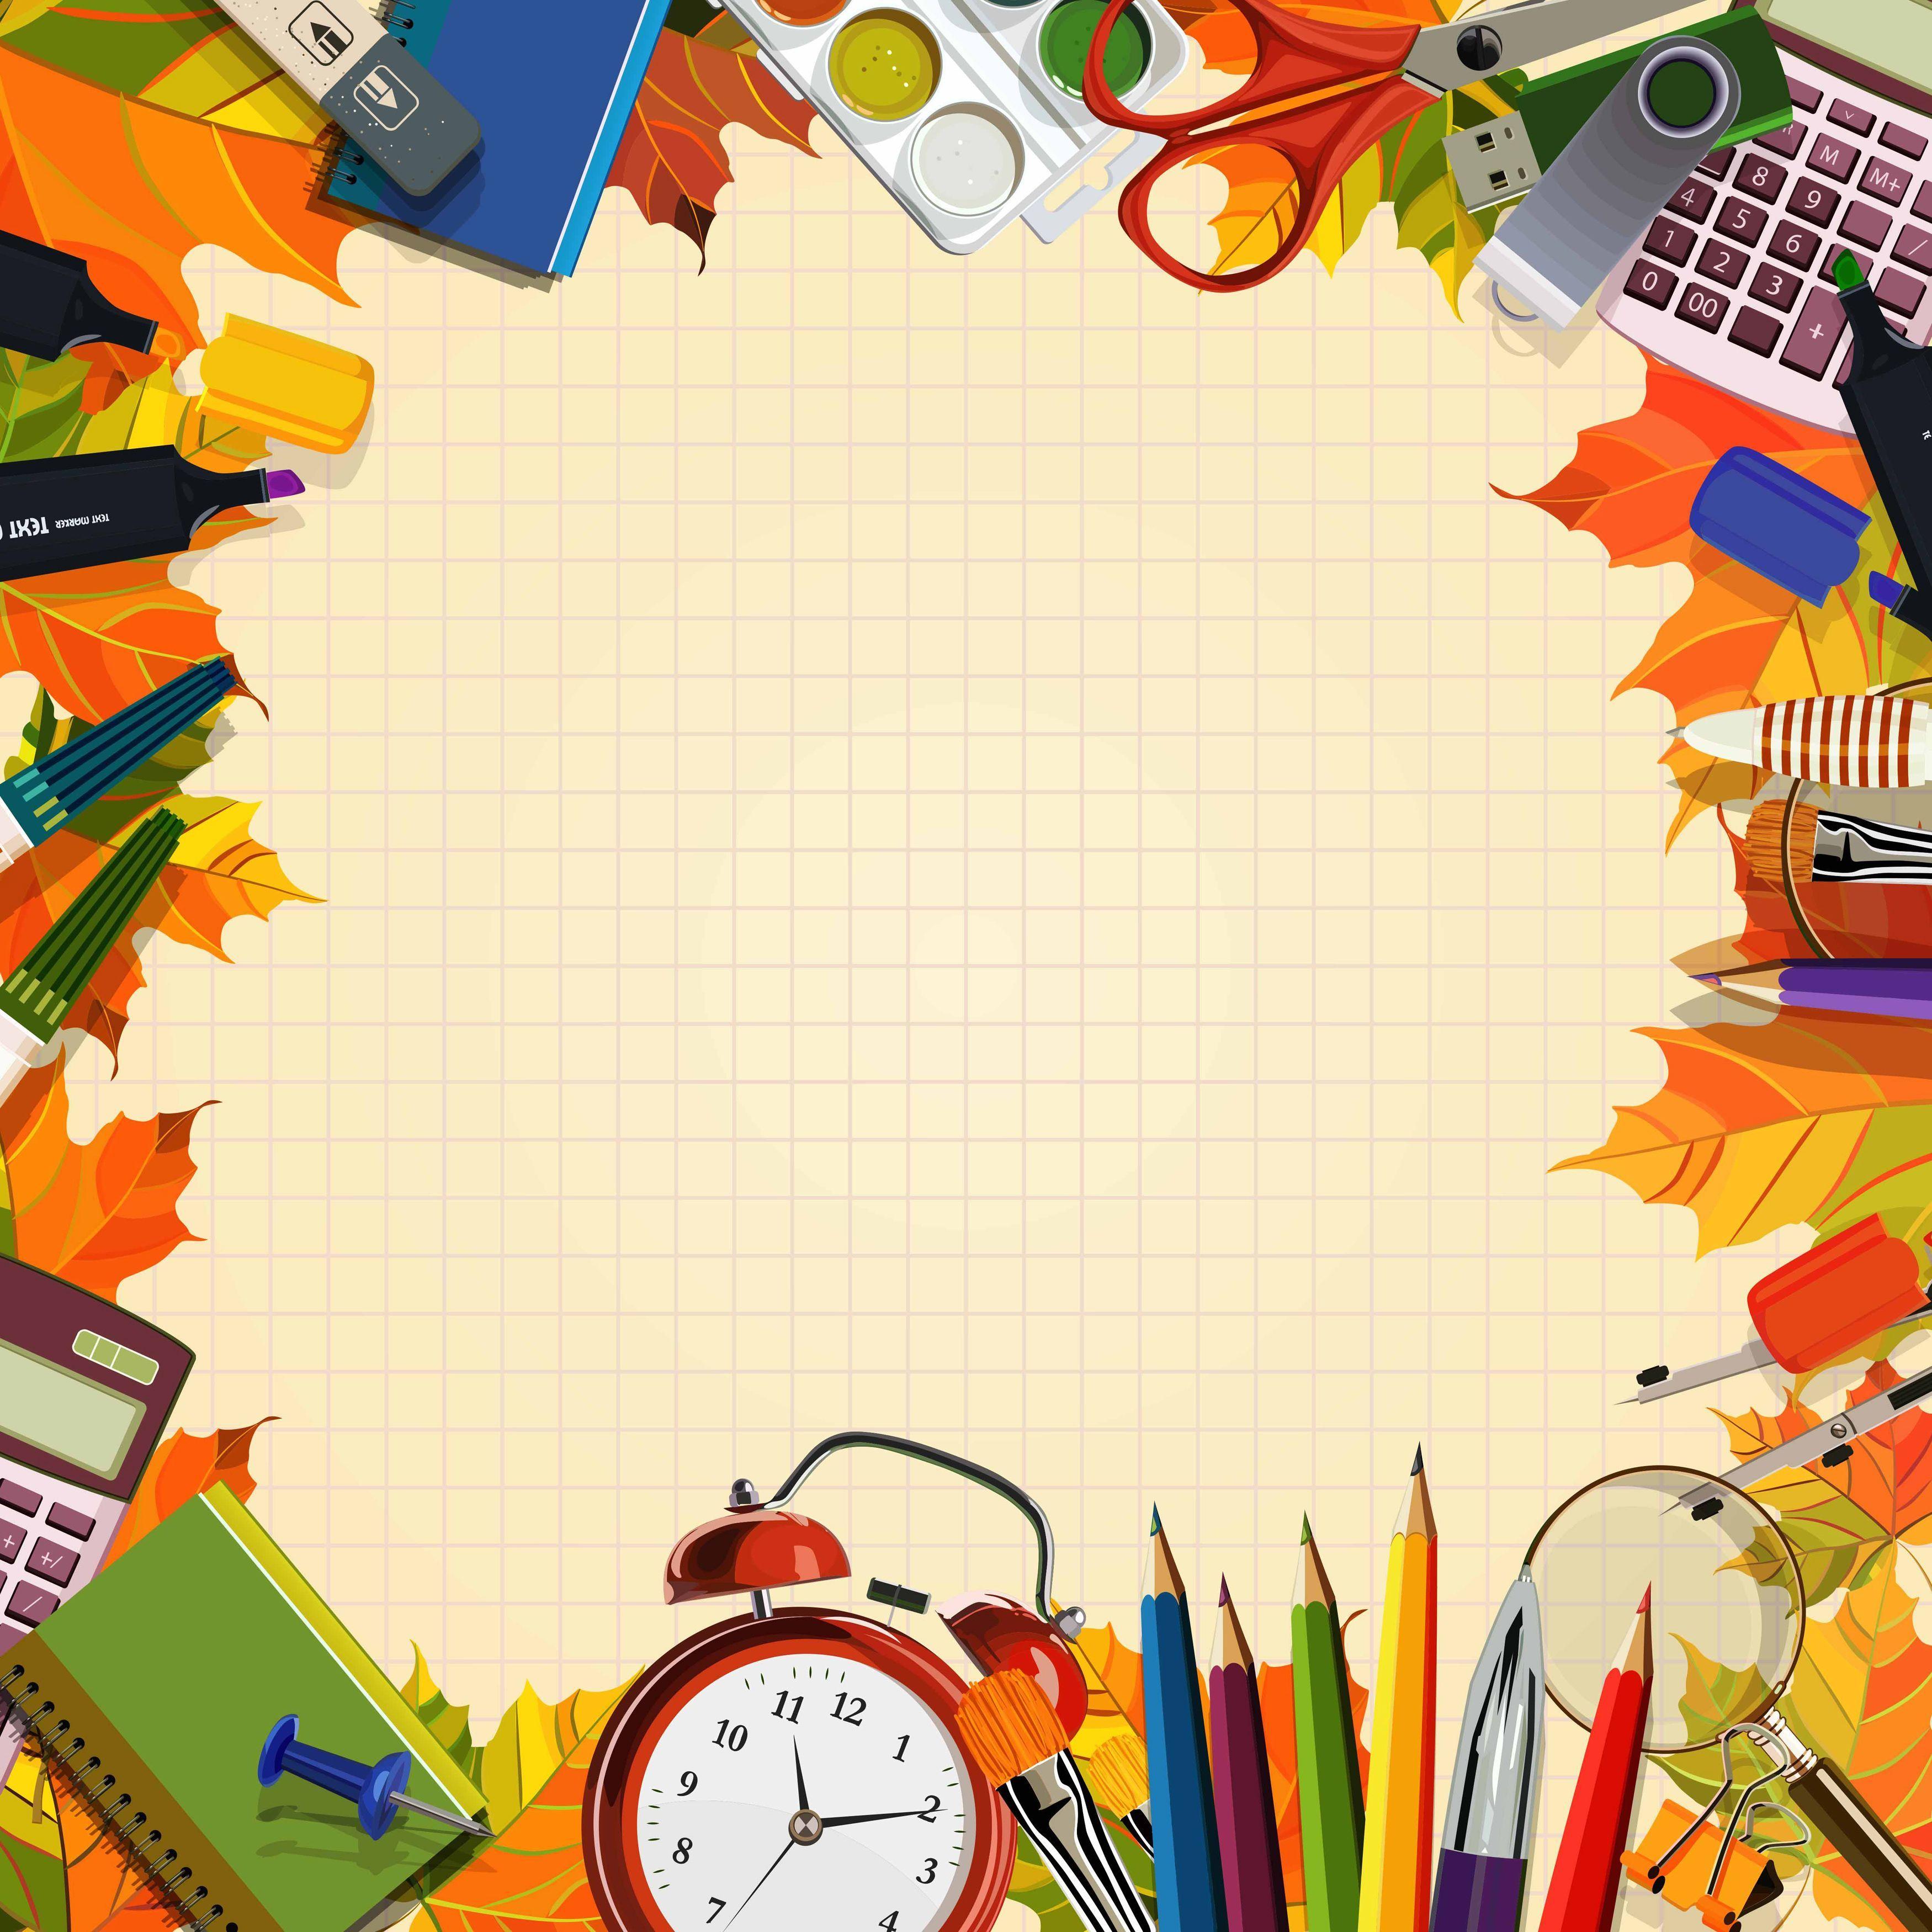 School Wallpaper Backgrounds Group.